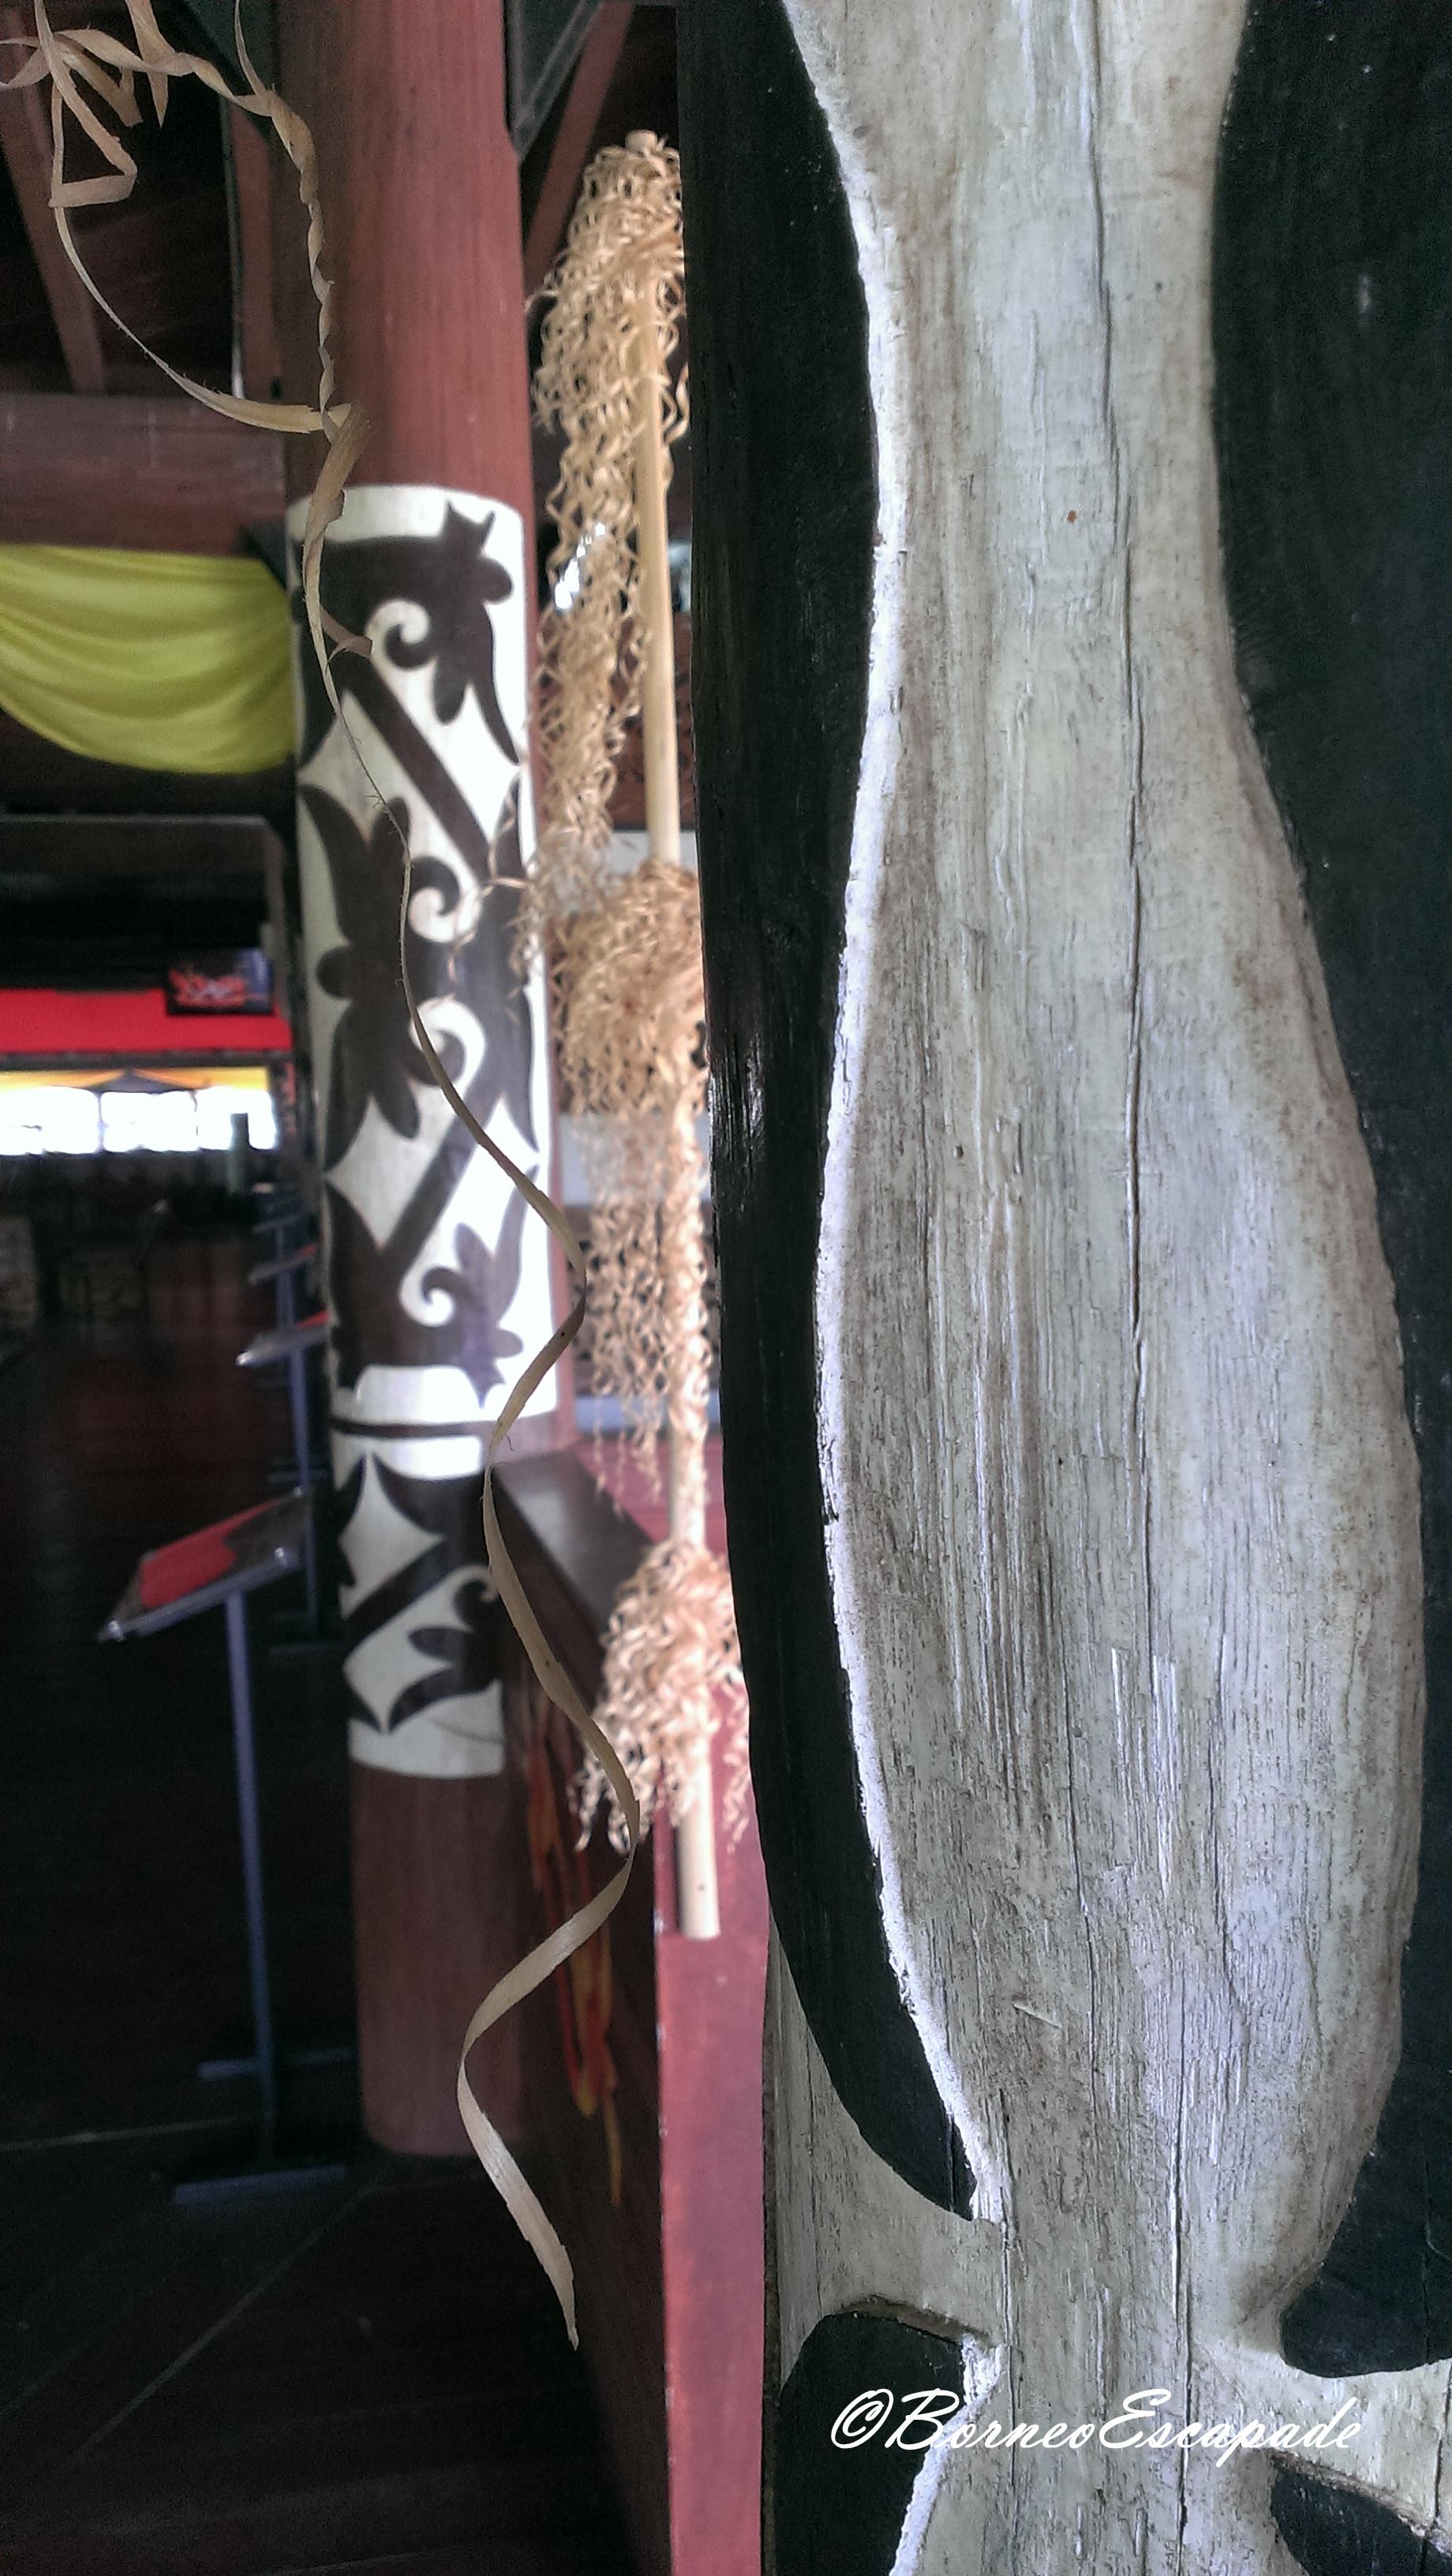 Wood carving on pillars known as SINIMPUNG